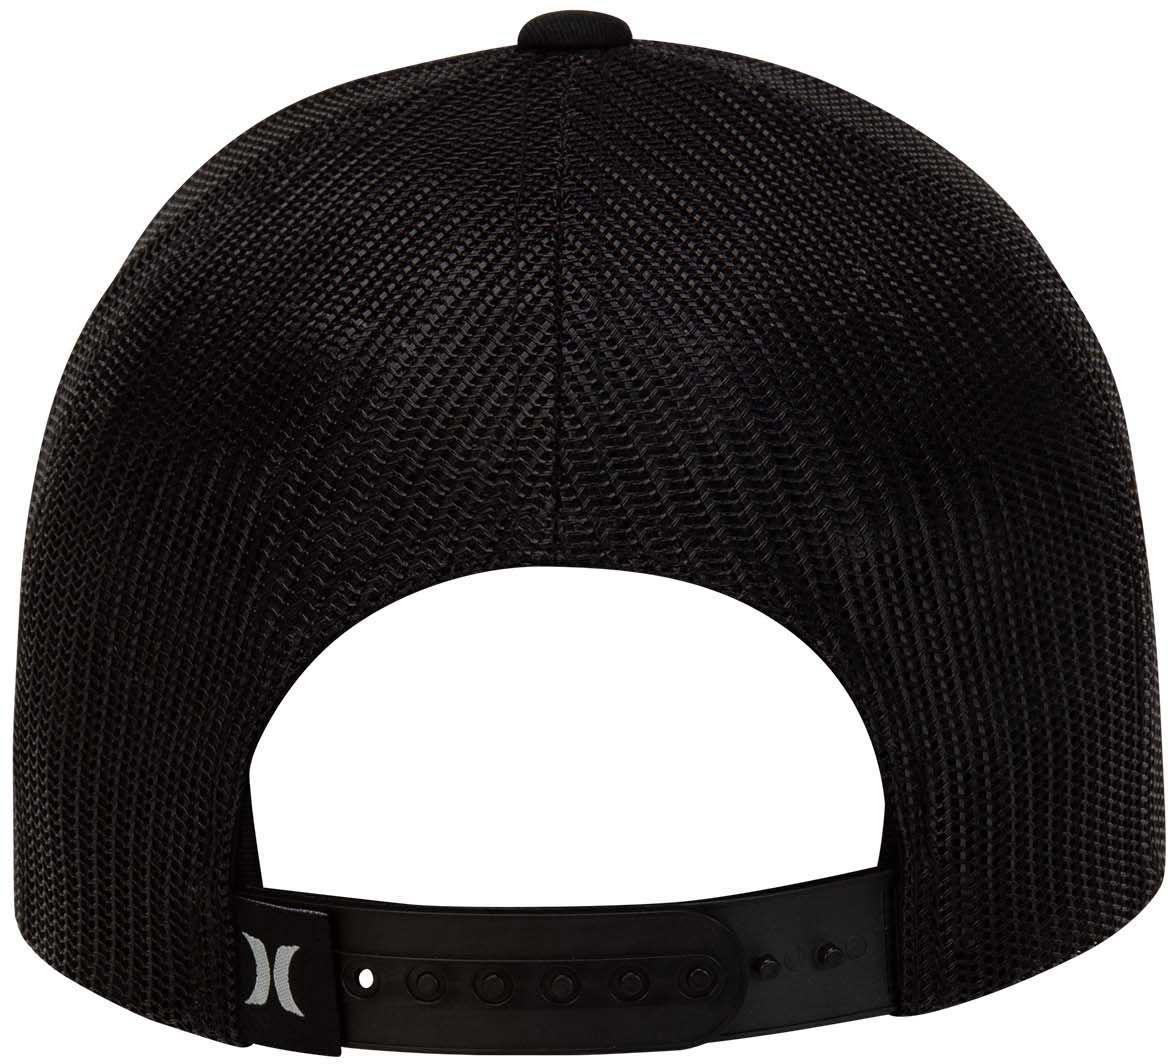 meet 3d65f be3c8 Hurley - Black Texas Trucker Hat for Men - Lyst. View fullscreen